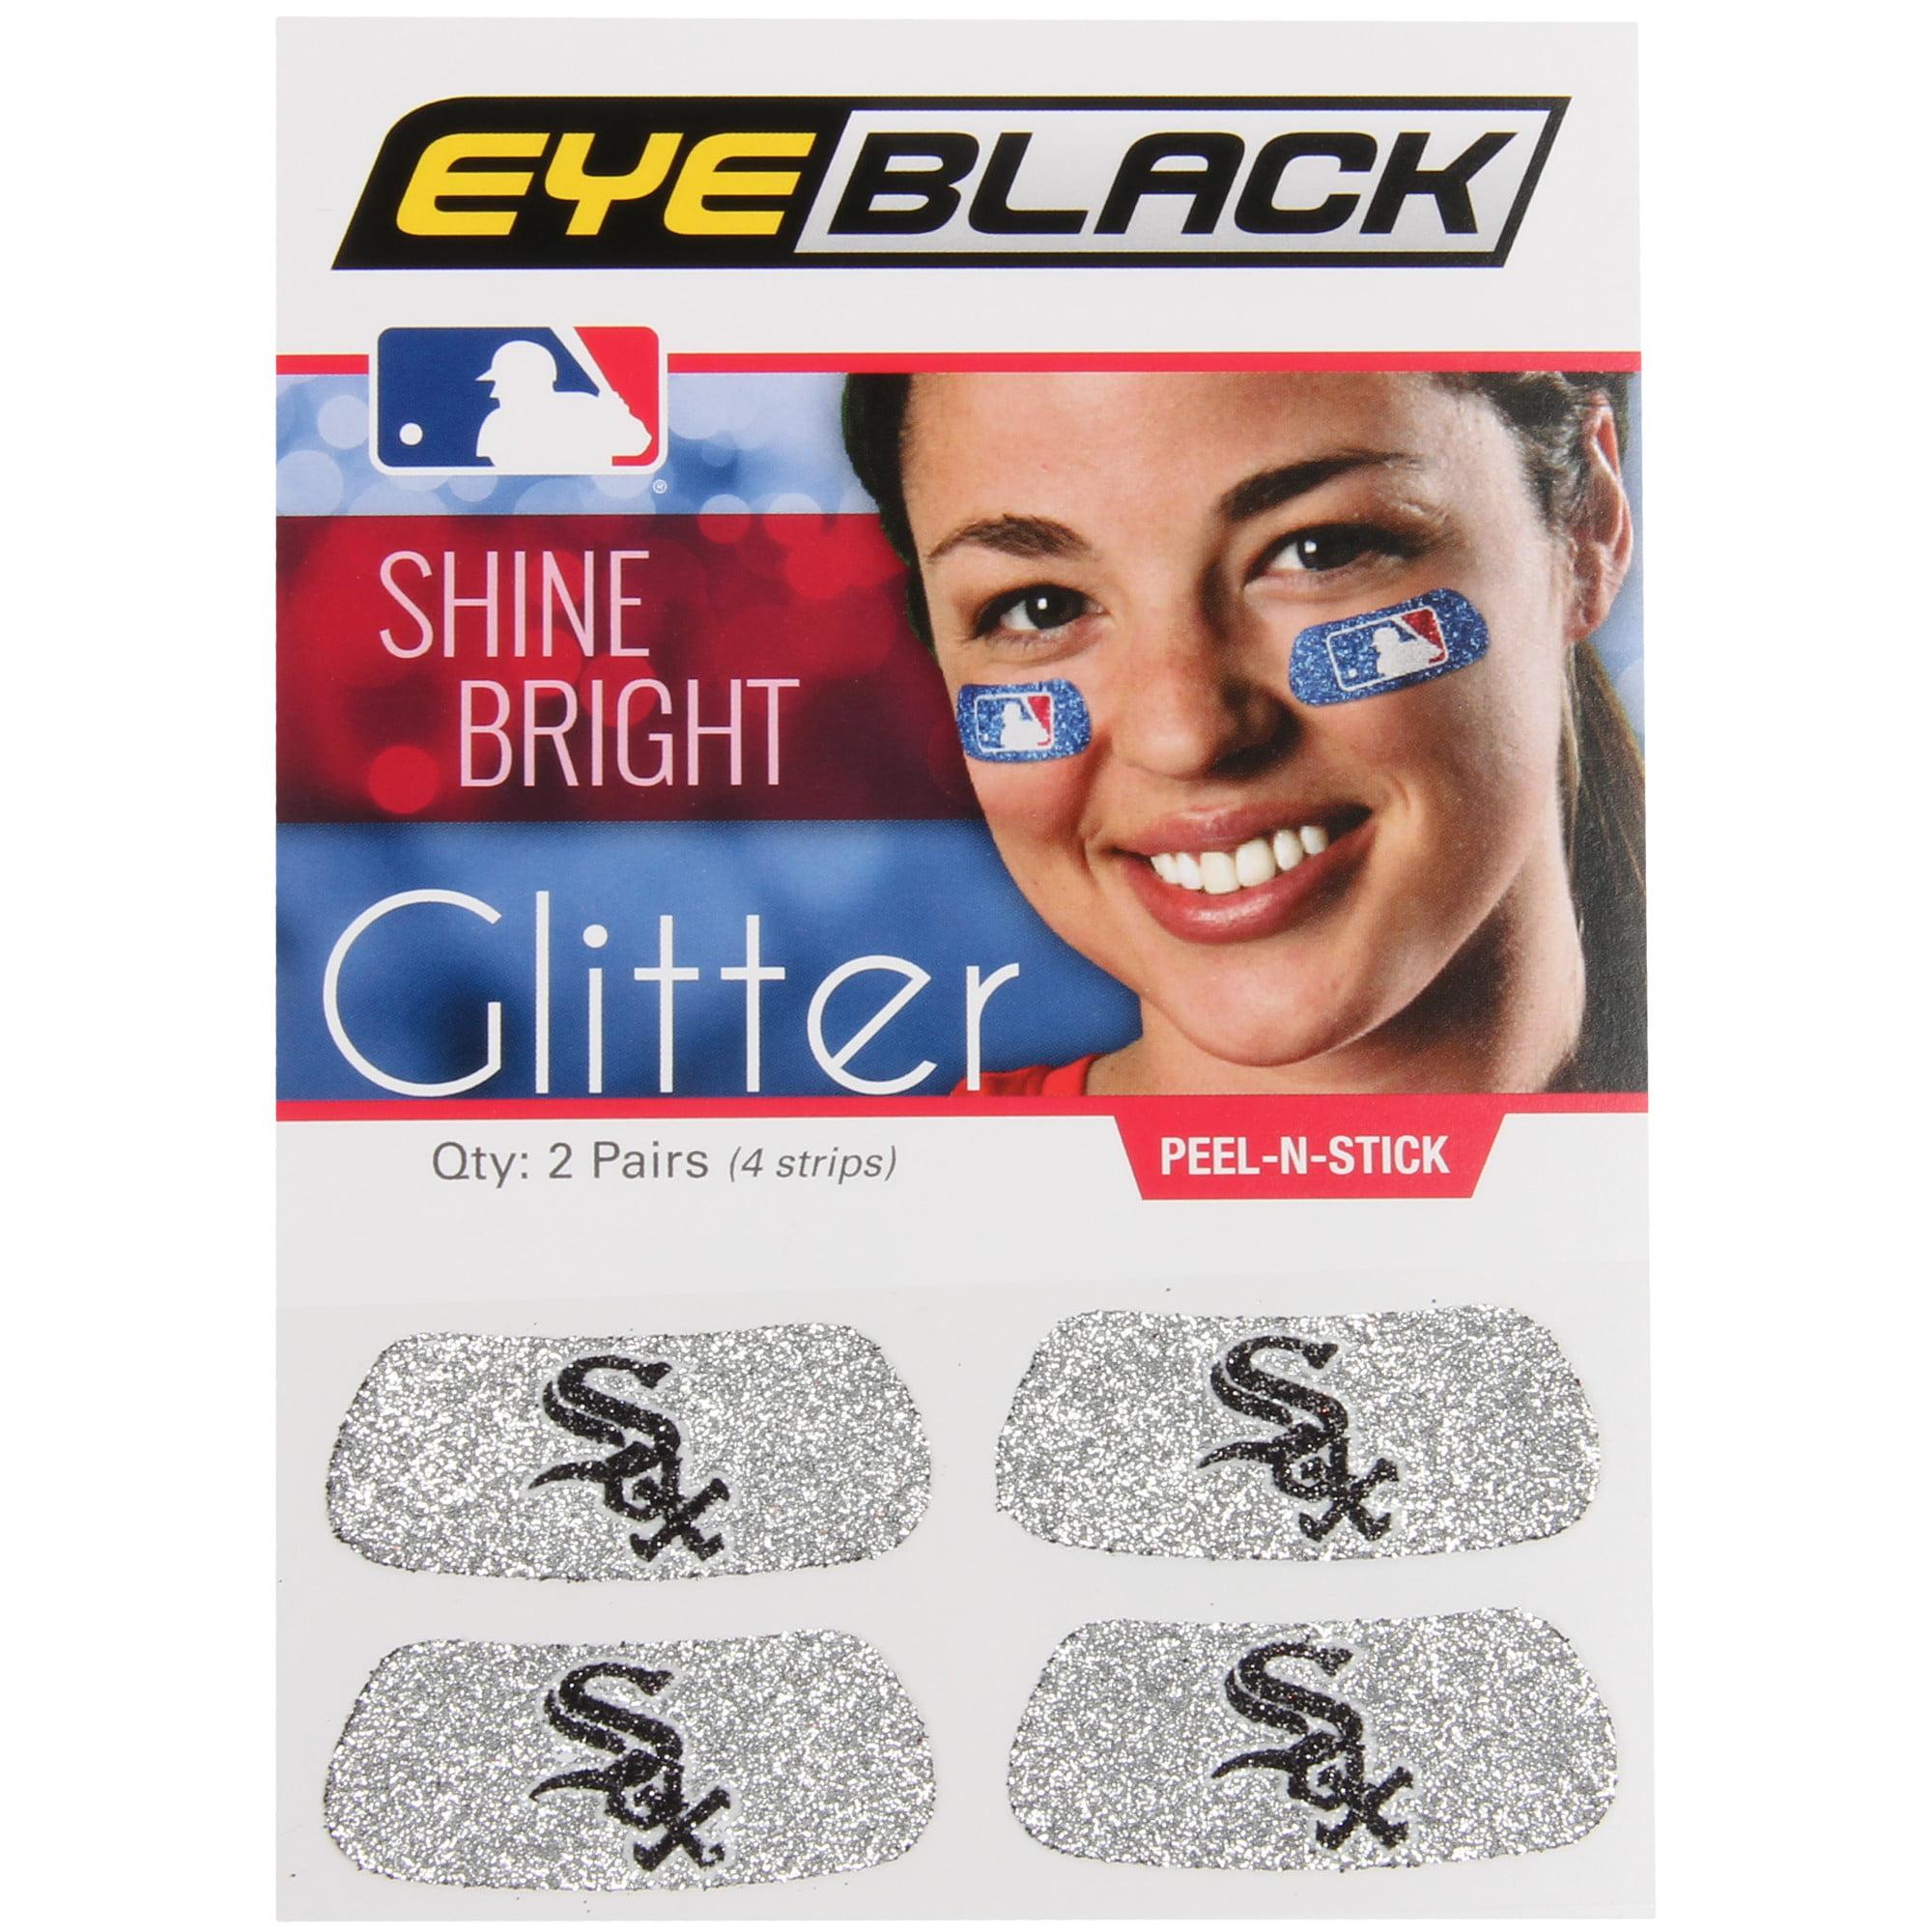 Chicago White Sox Glitter Eyeblack - No Size